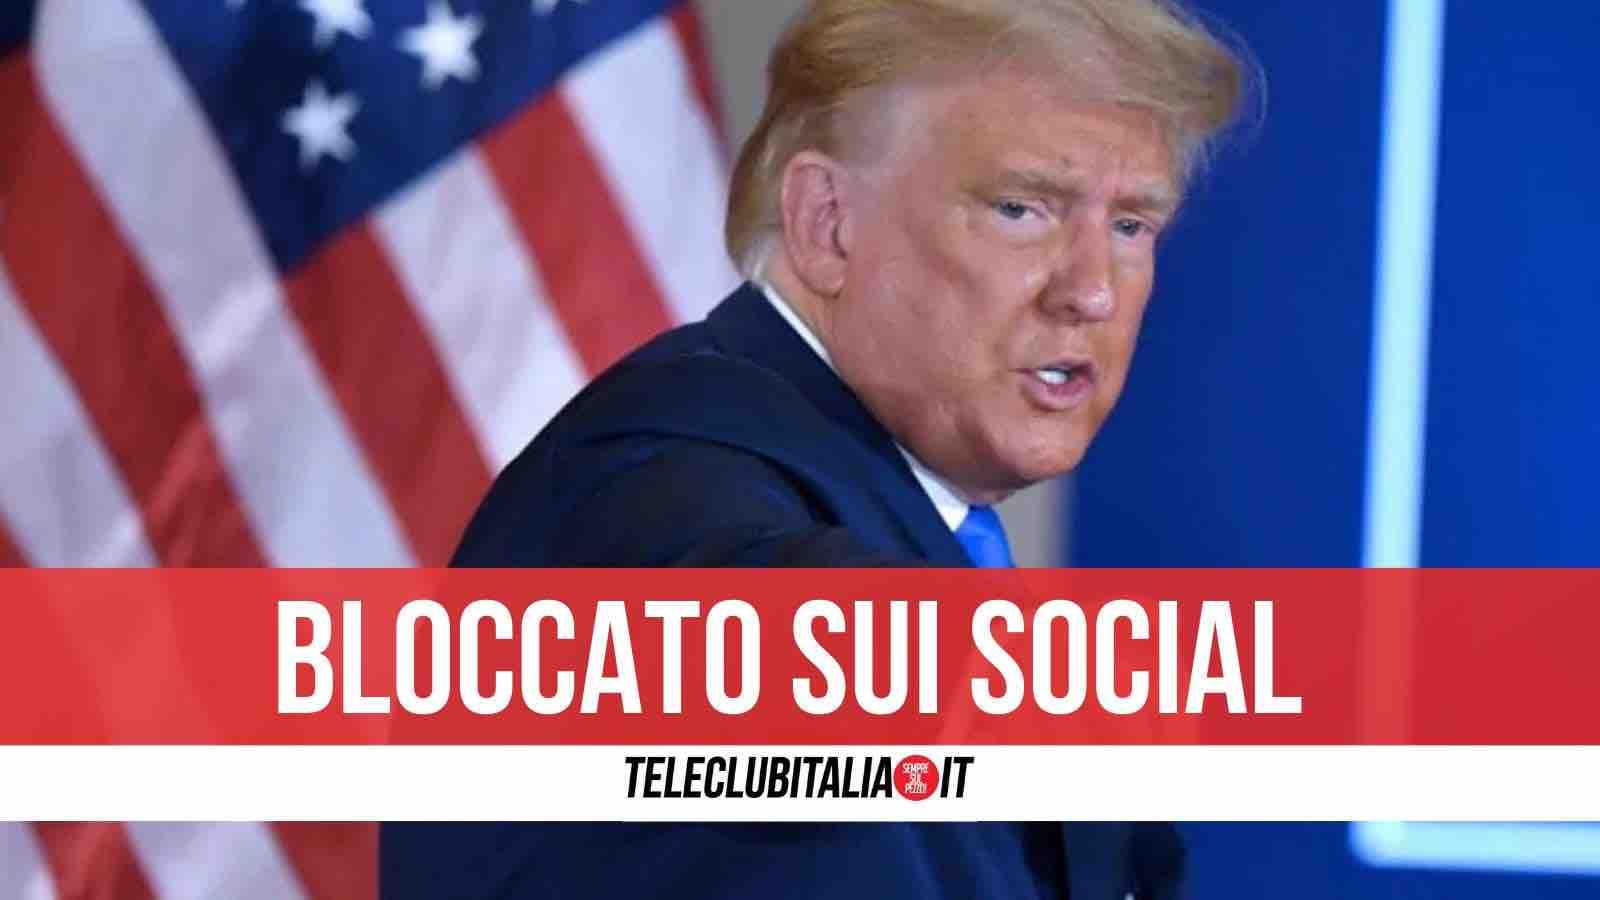 Le musa mancanti : Nera , rosa … trasparente : Cronache multicolori >  Trump-facebook-instagram